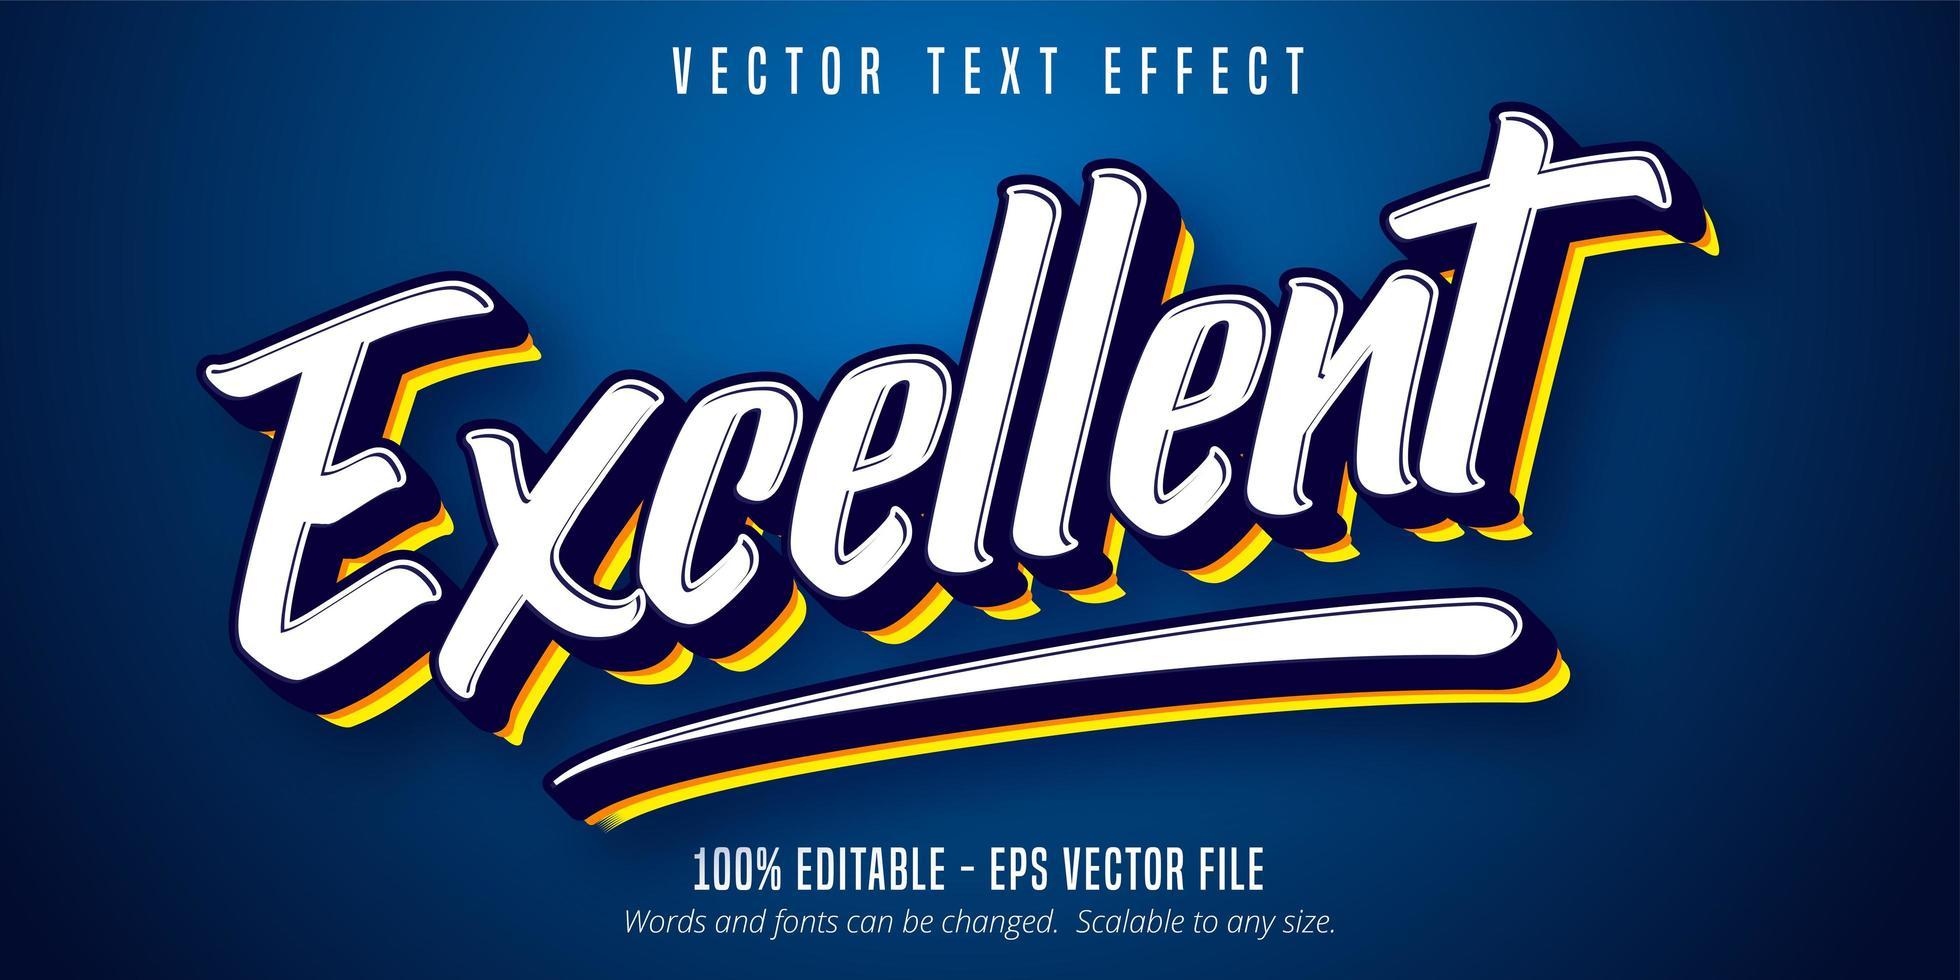 Hervorragender Skript-Texteffekt vektor